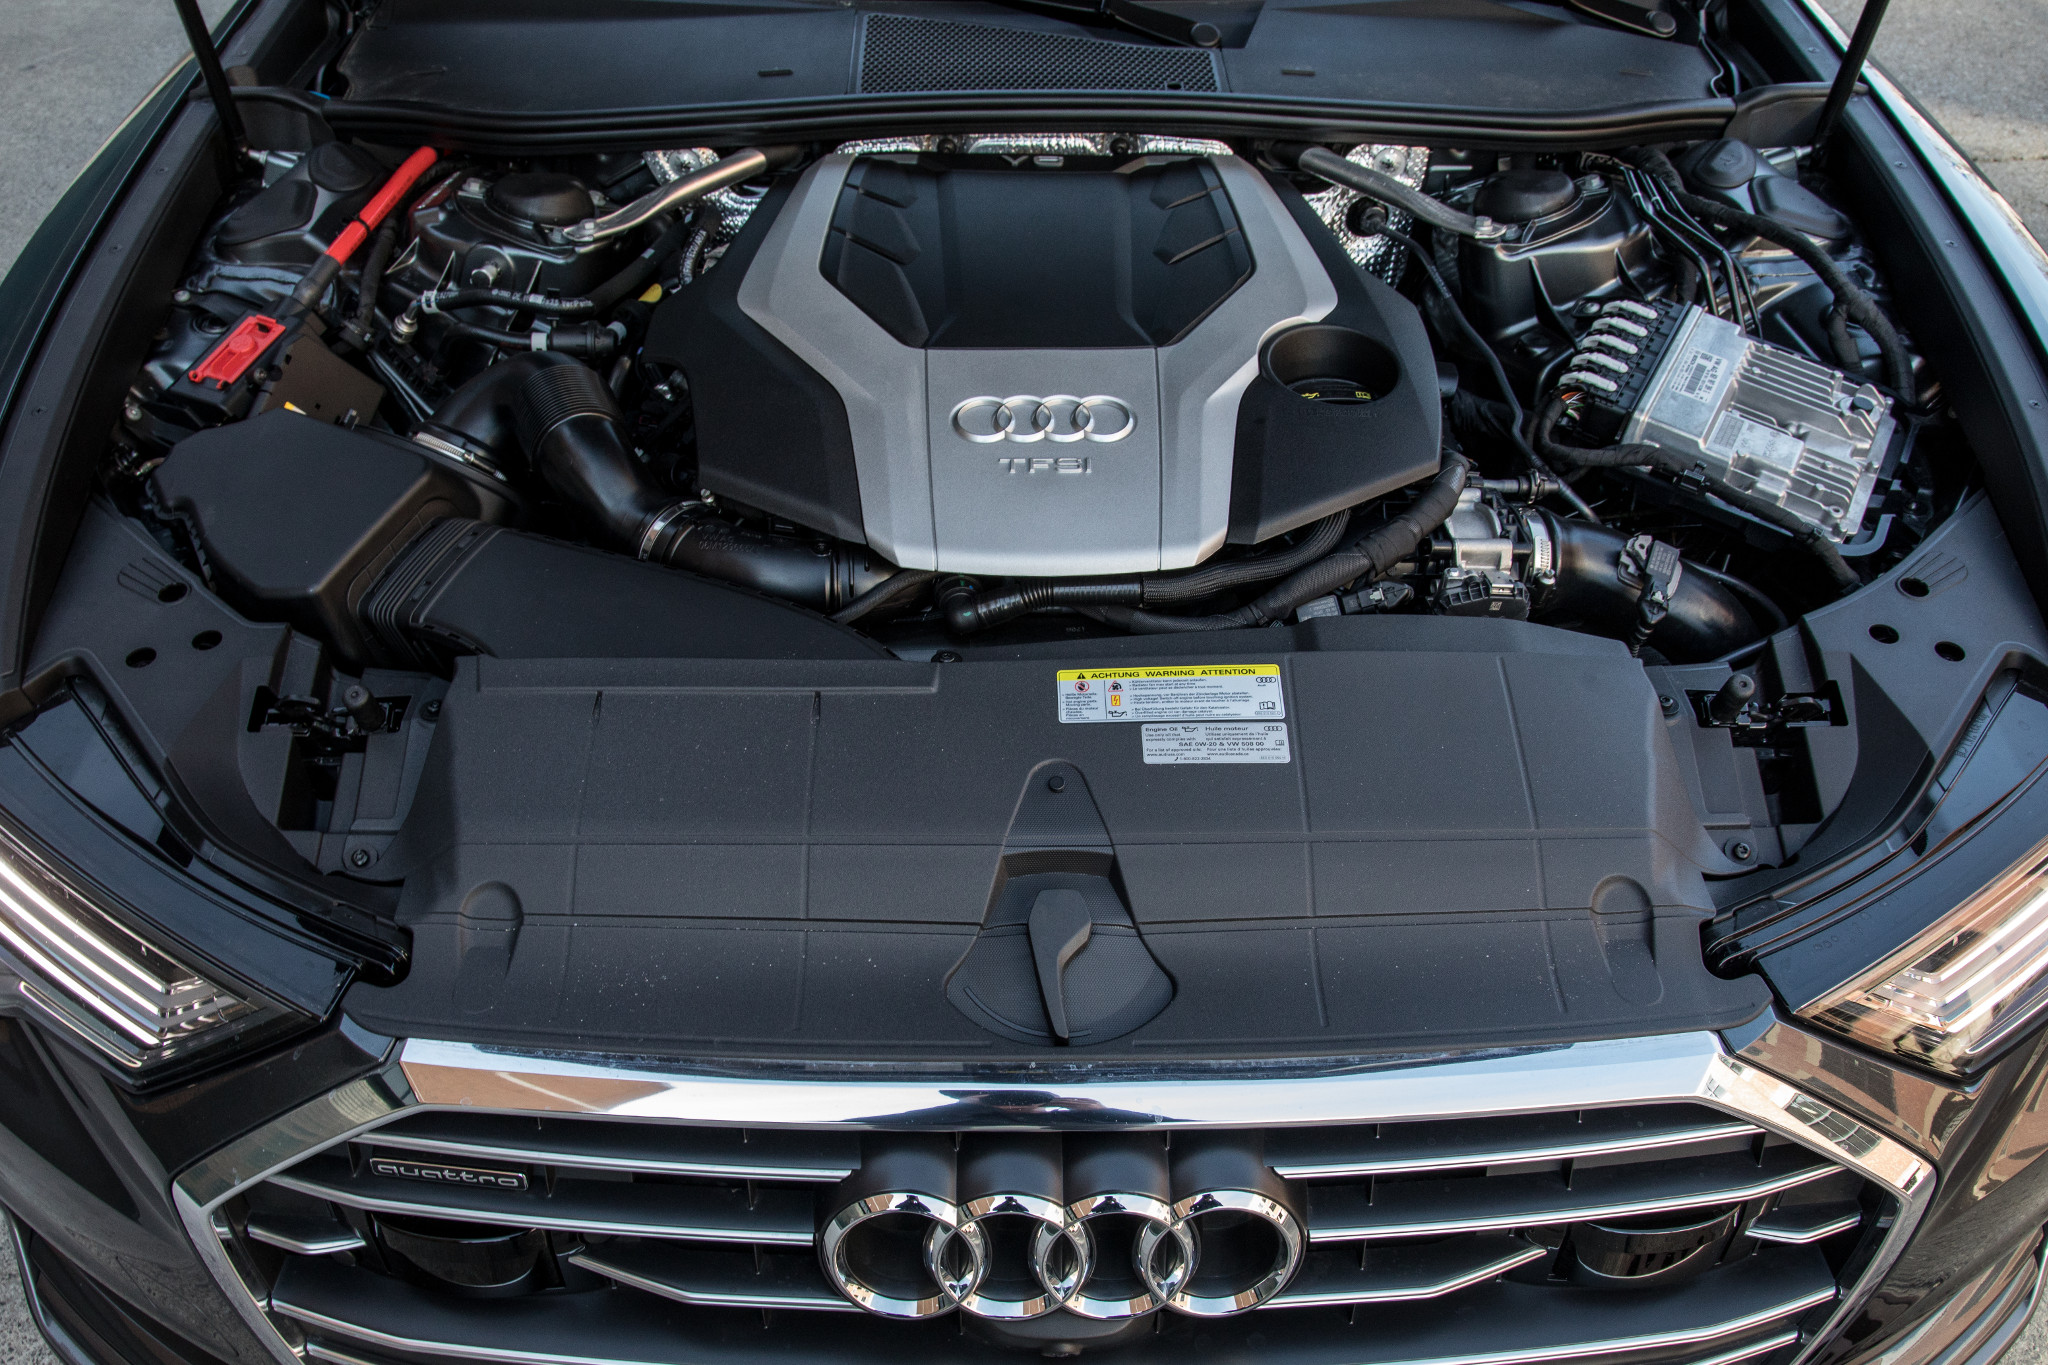 14-audi-a6-2019-engine--exterior--grey.jpg